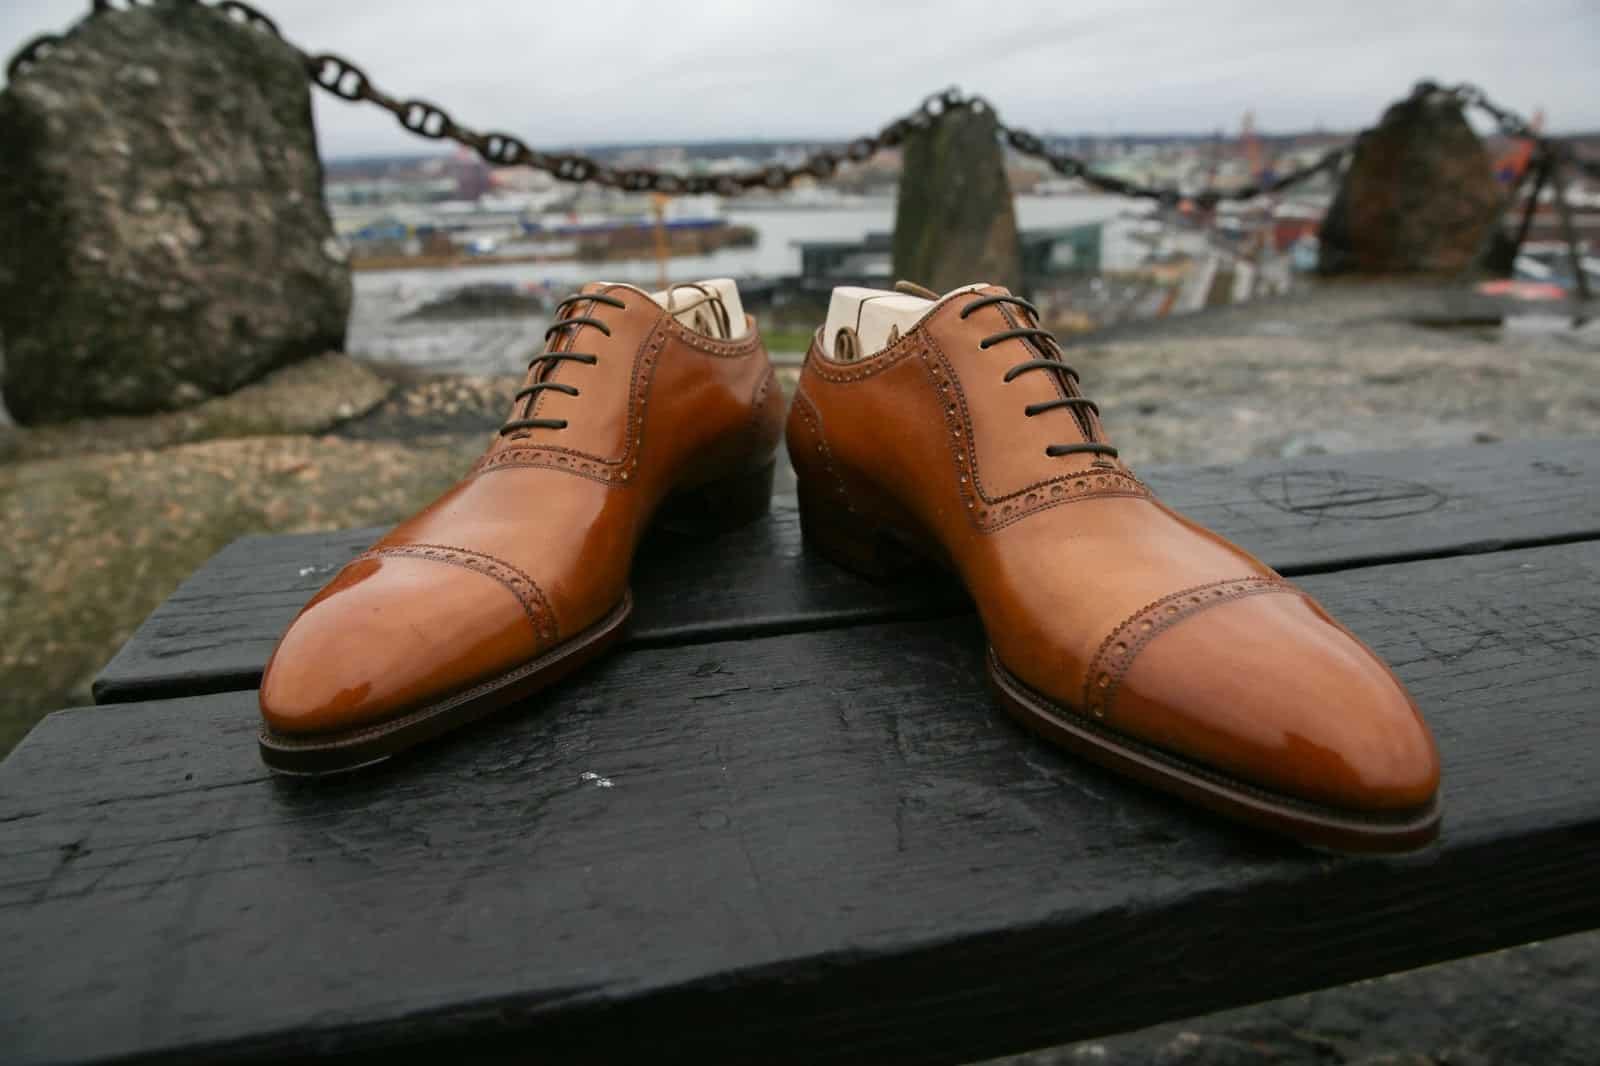 shoegazing.seskobibliotekj fitzpatrick fremont